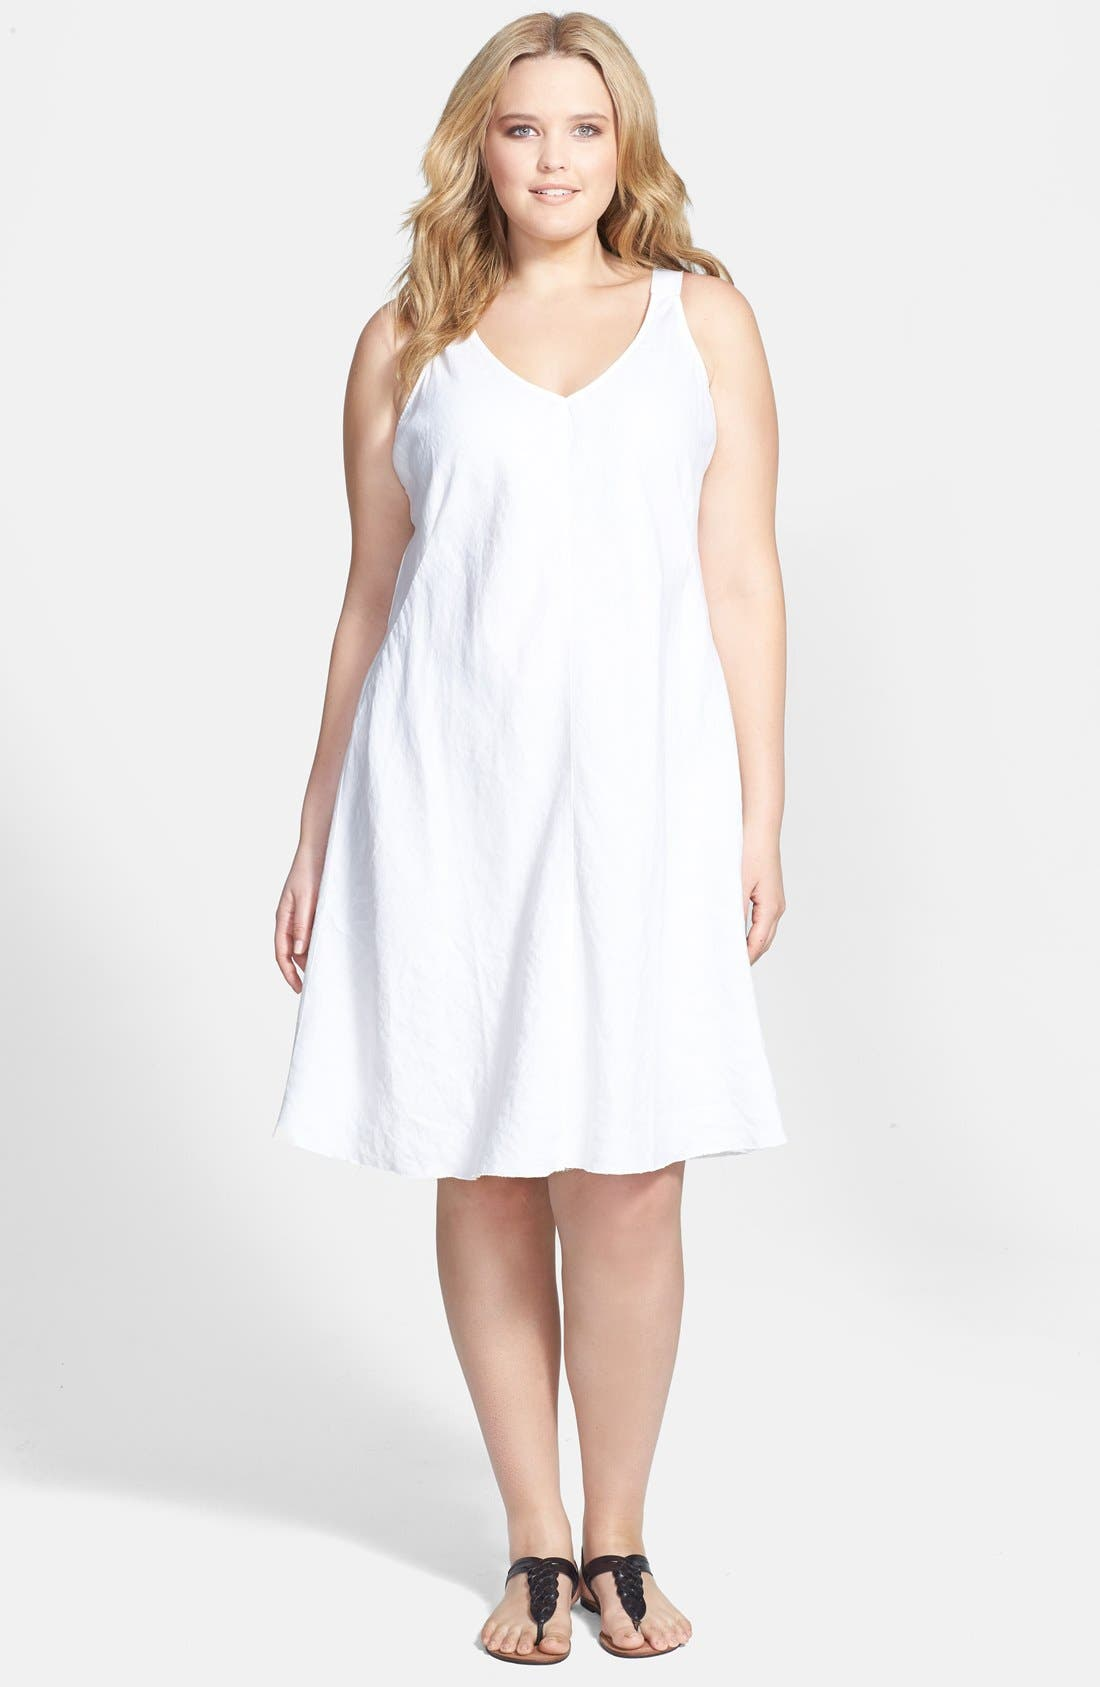 Alternate Image 1 Selected - Eileen Fisher V-Neck Bias Cut Organic Linen Dress (Plus Size)